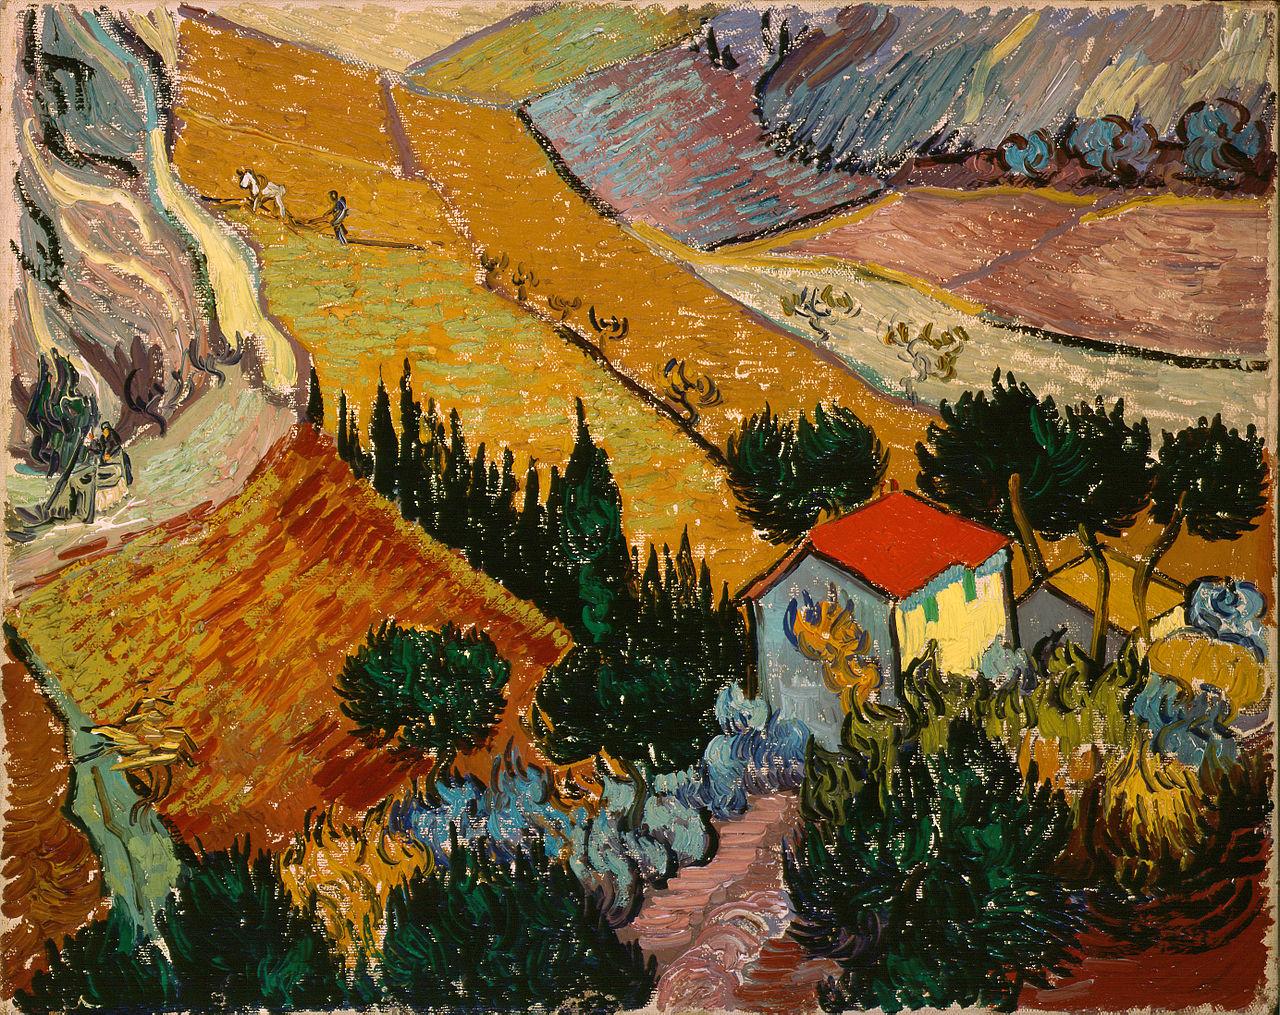 Landscape with House and Ploughman, 1889 - Vincent van Gogh ...